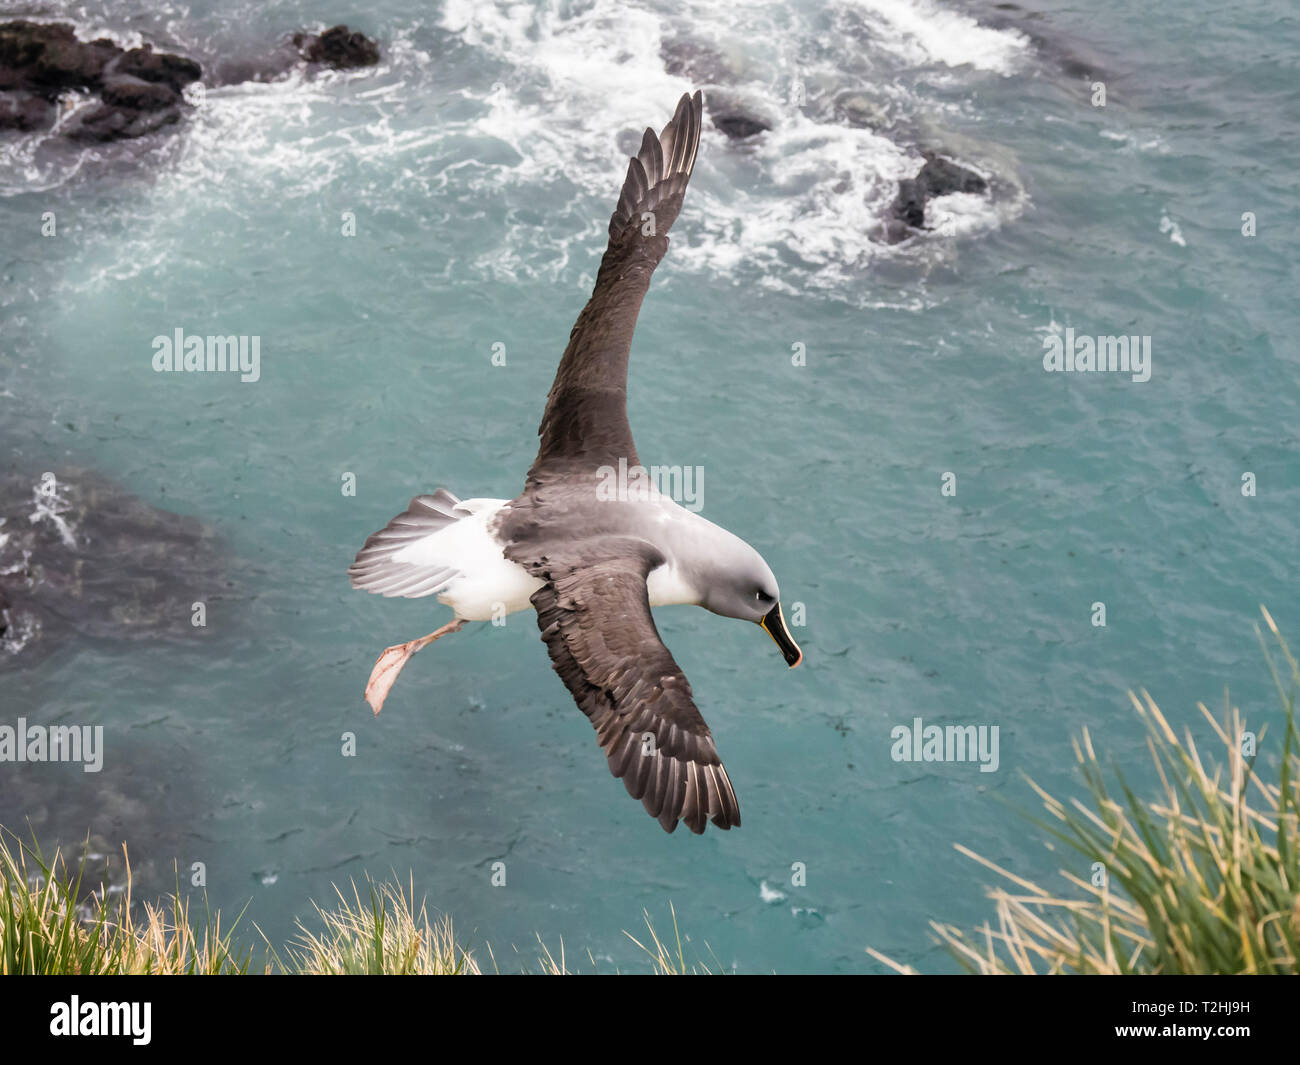 Adult grey-headed albatross, Thalassarche chrysostoma, returning to nest site at Elsehul, South Georgia Island, Atlantic Ocean - Stock Image